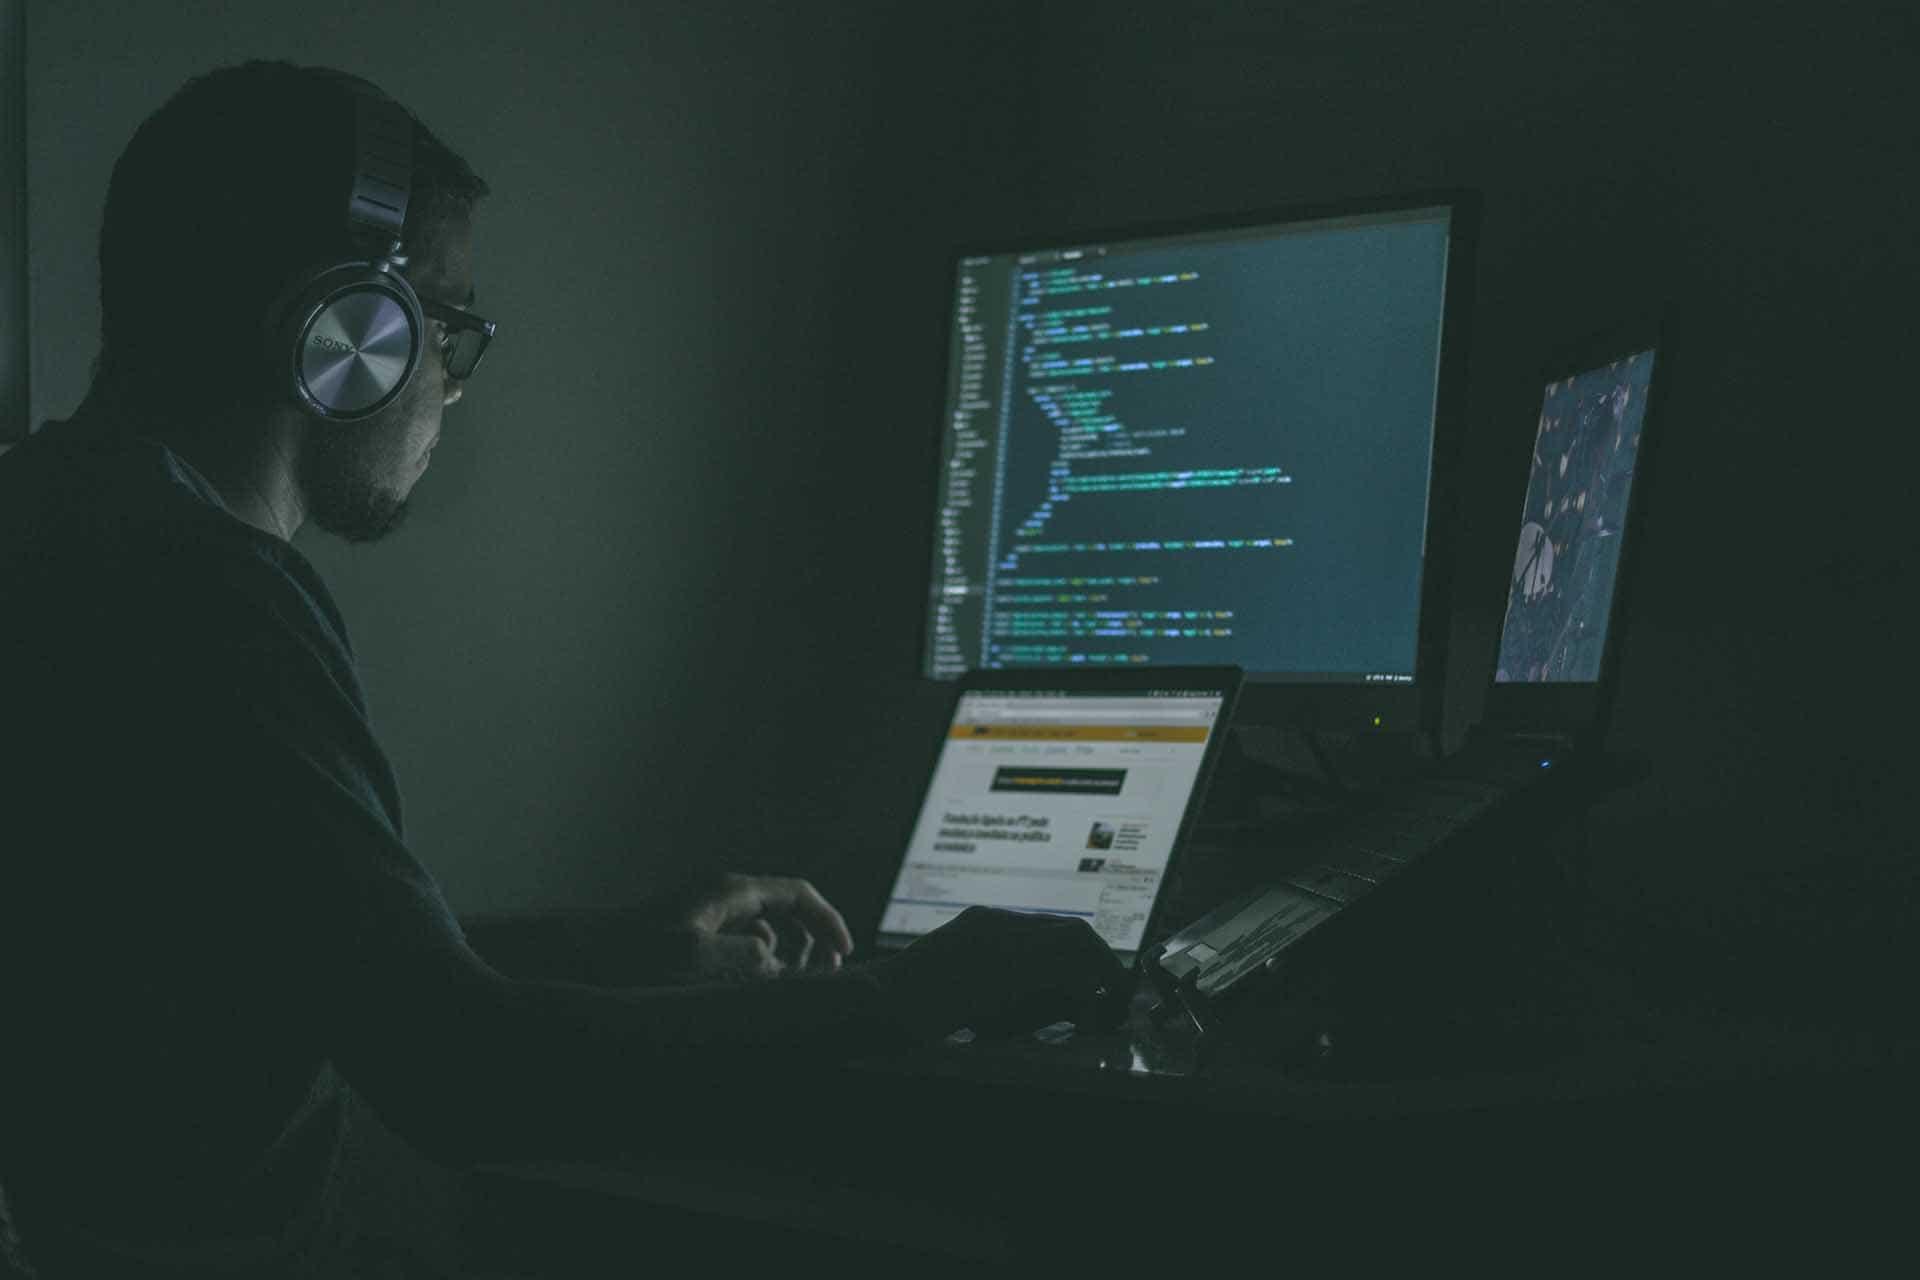 t2informatik Blog: Agile Requirements Engineering